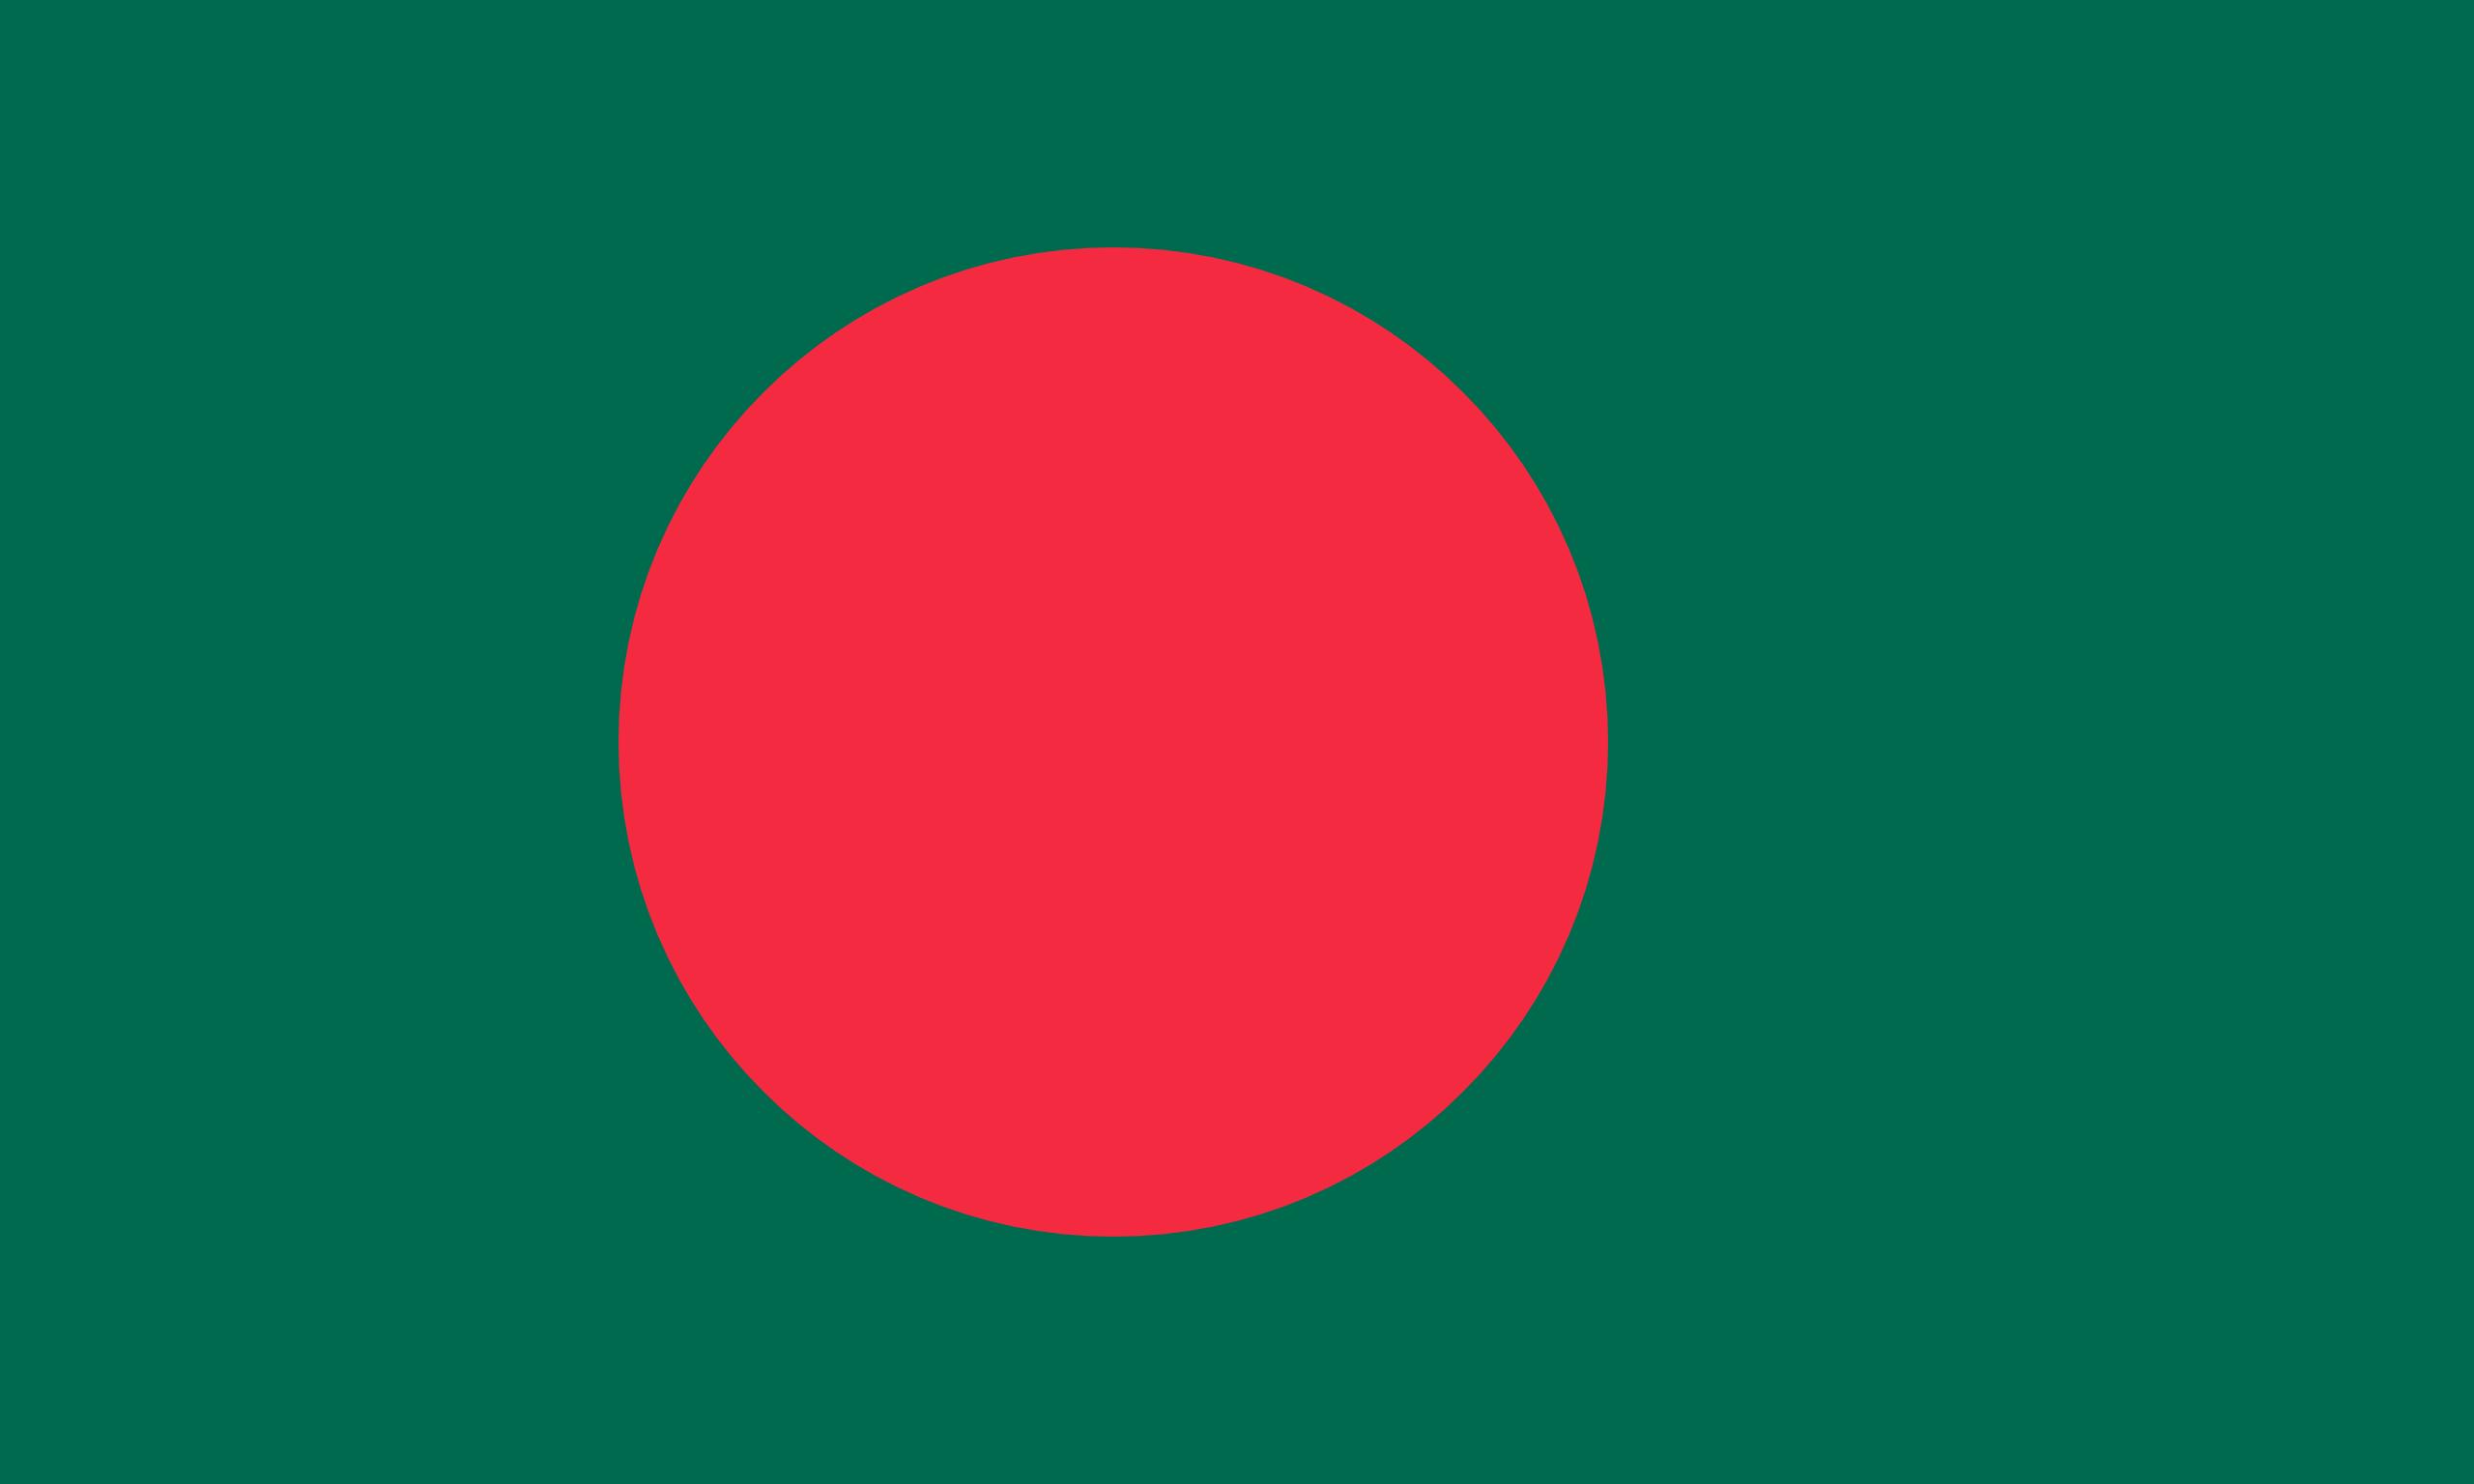 bangladesh, país, emblema, insignia, símbolo - Fondos de Pantalla HD - professor-falken.com